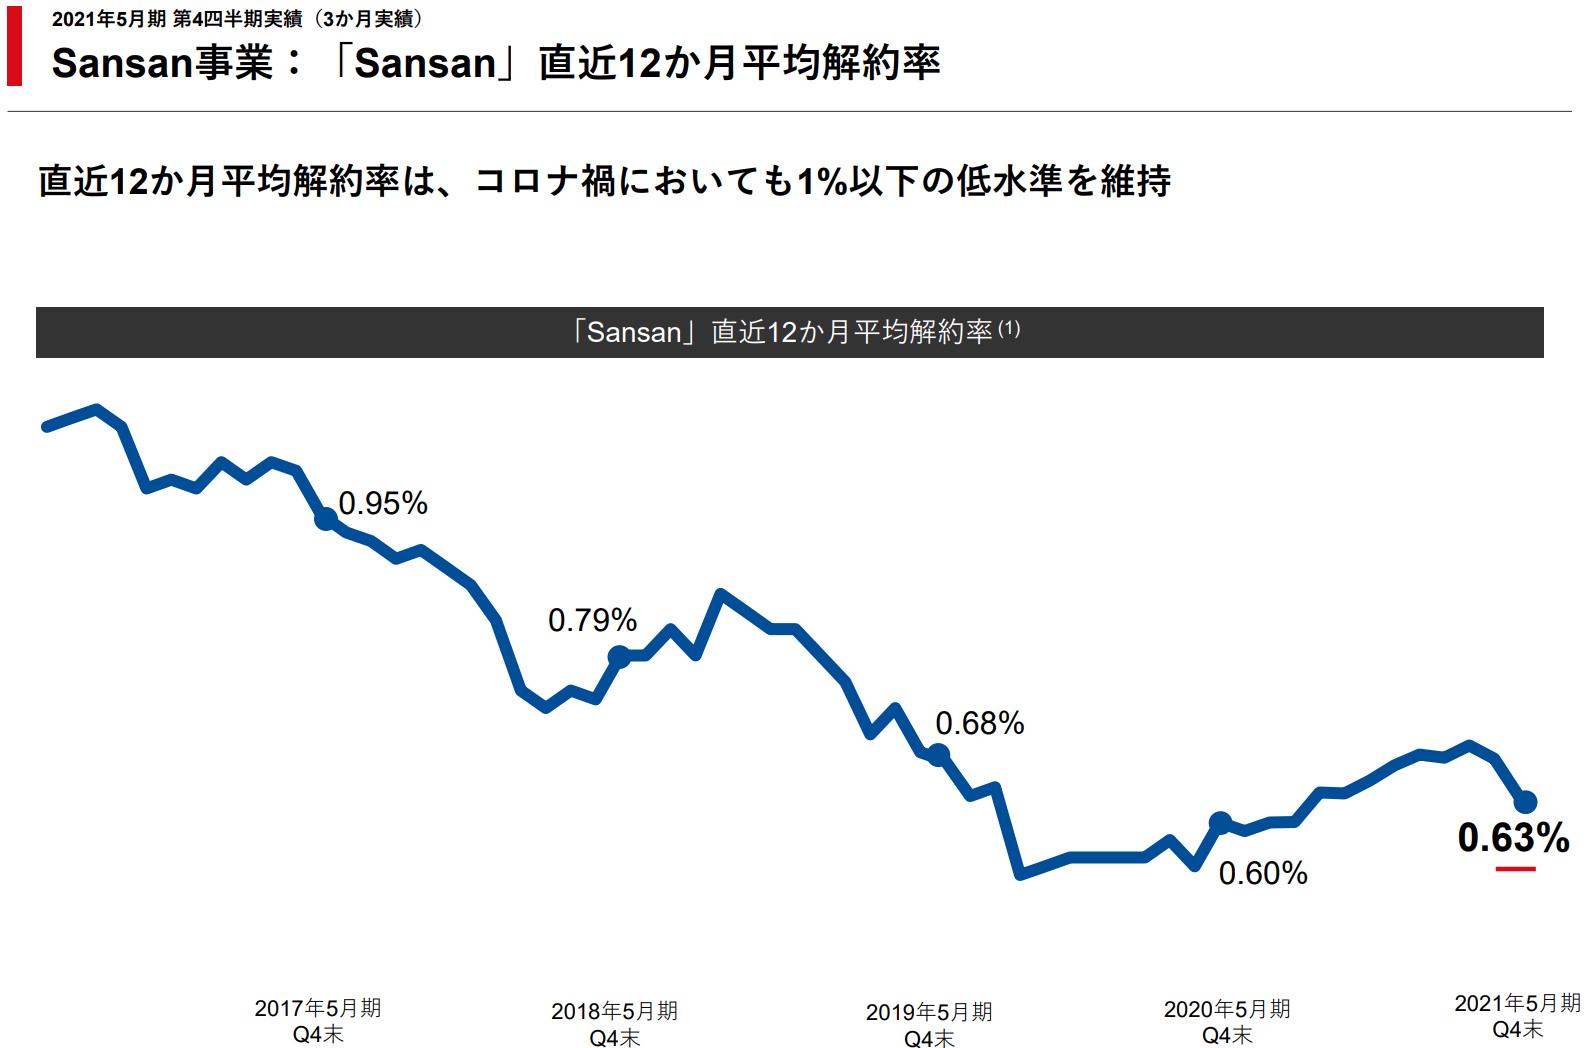 sansan:平均解約率